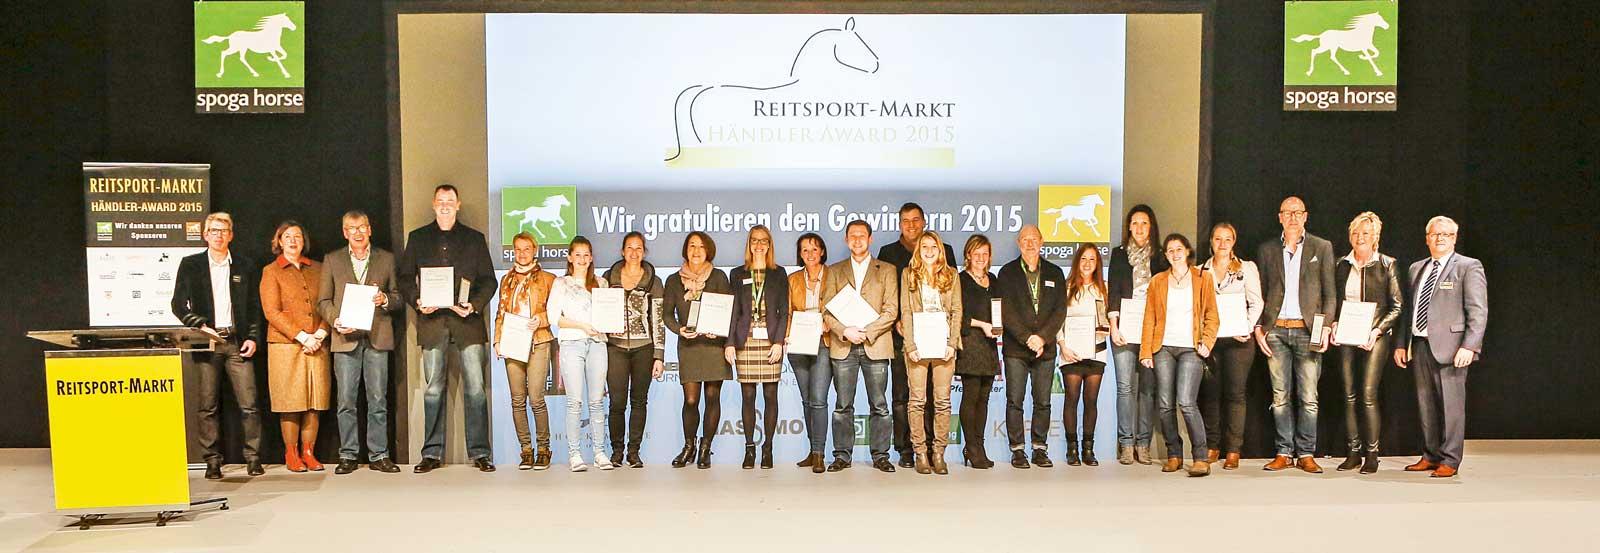 Reitsport Live, Händler Award 2014